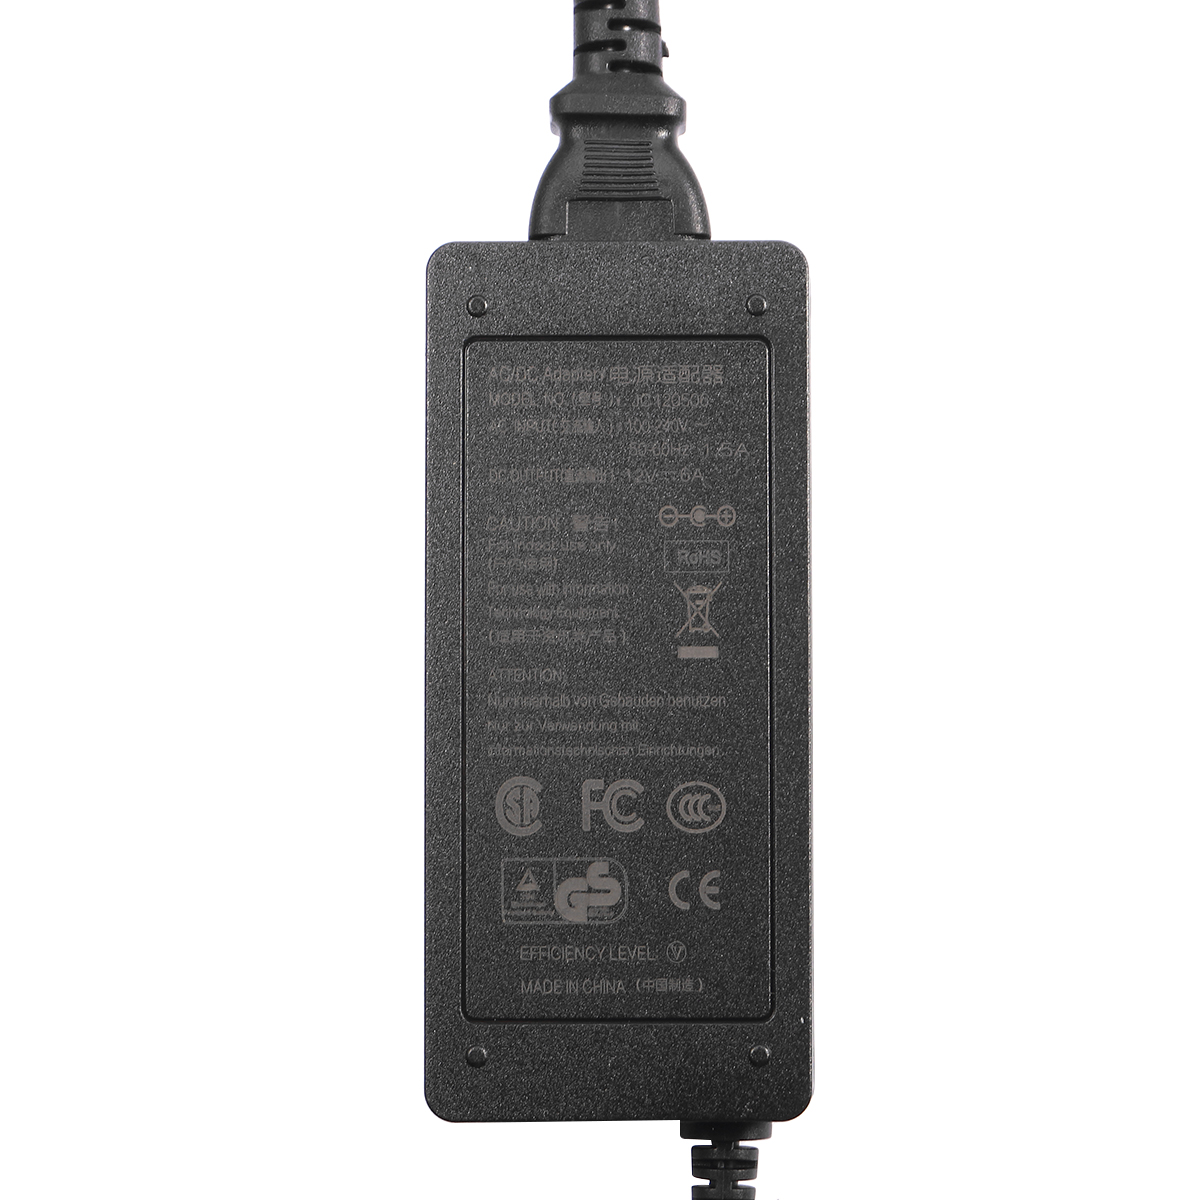 Self-Priming Booster Pump Adapter for 12V 60W 80W Diaphragm High Pressure Water Pump